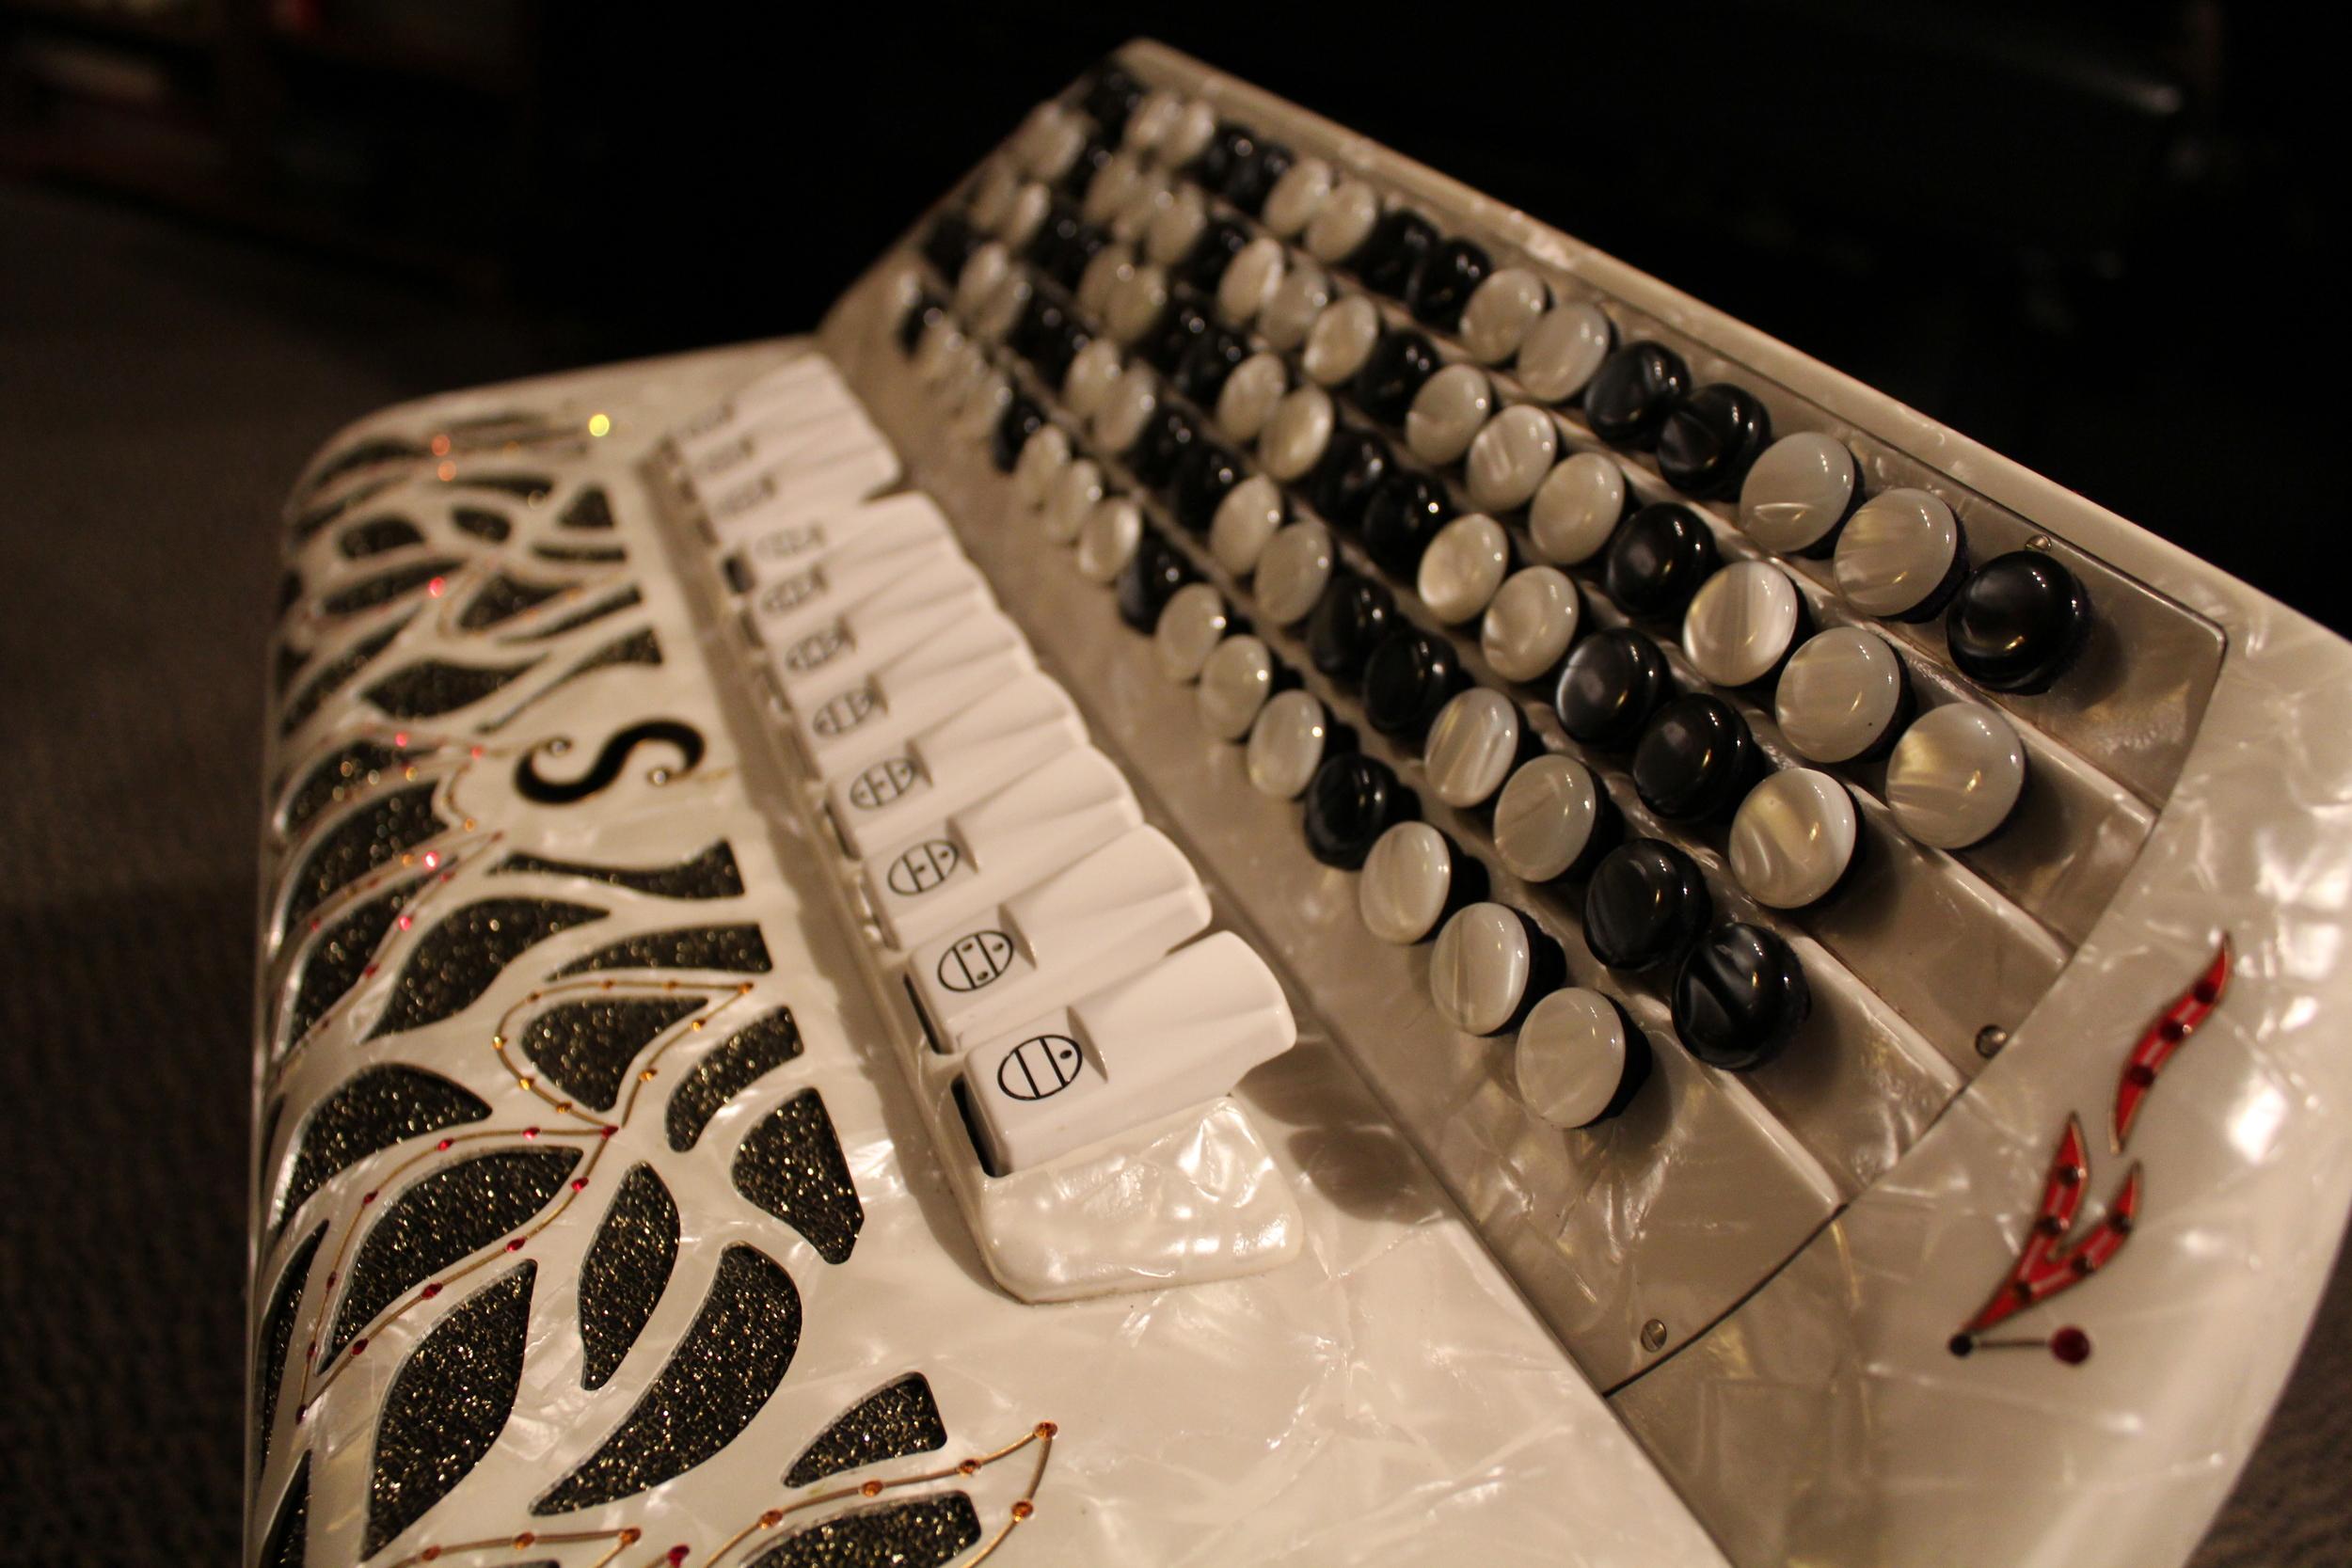 accordion by janne.jpg